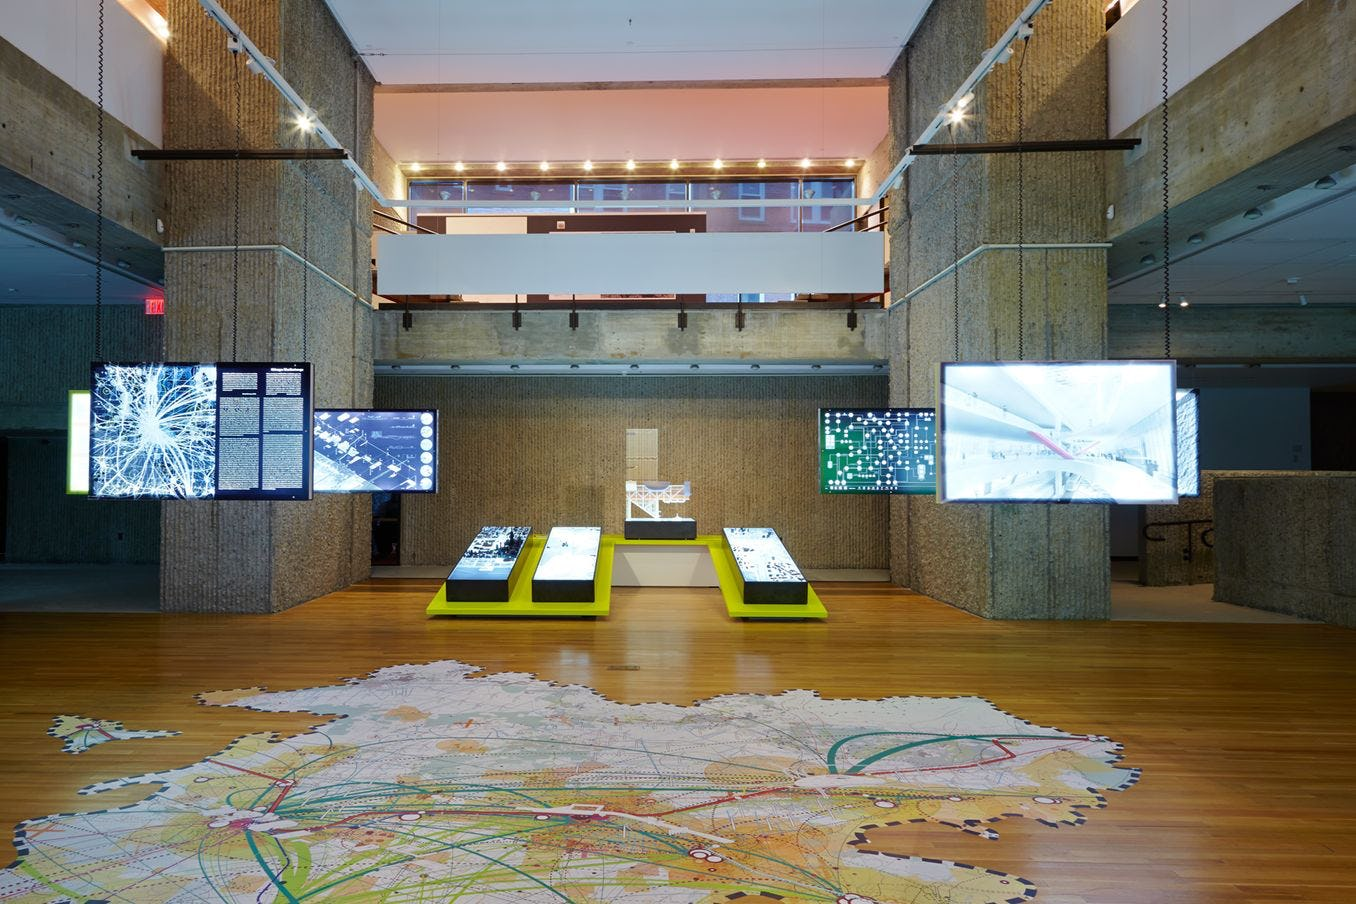 Infra eco logi urbanism yale 04